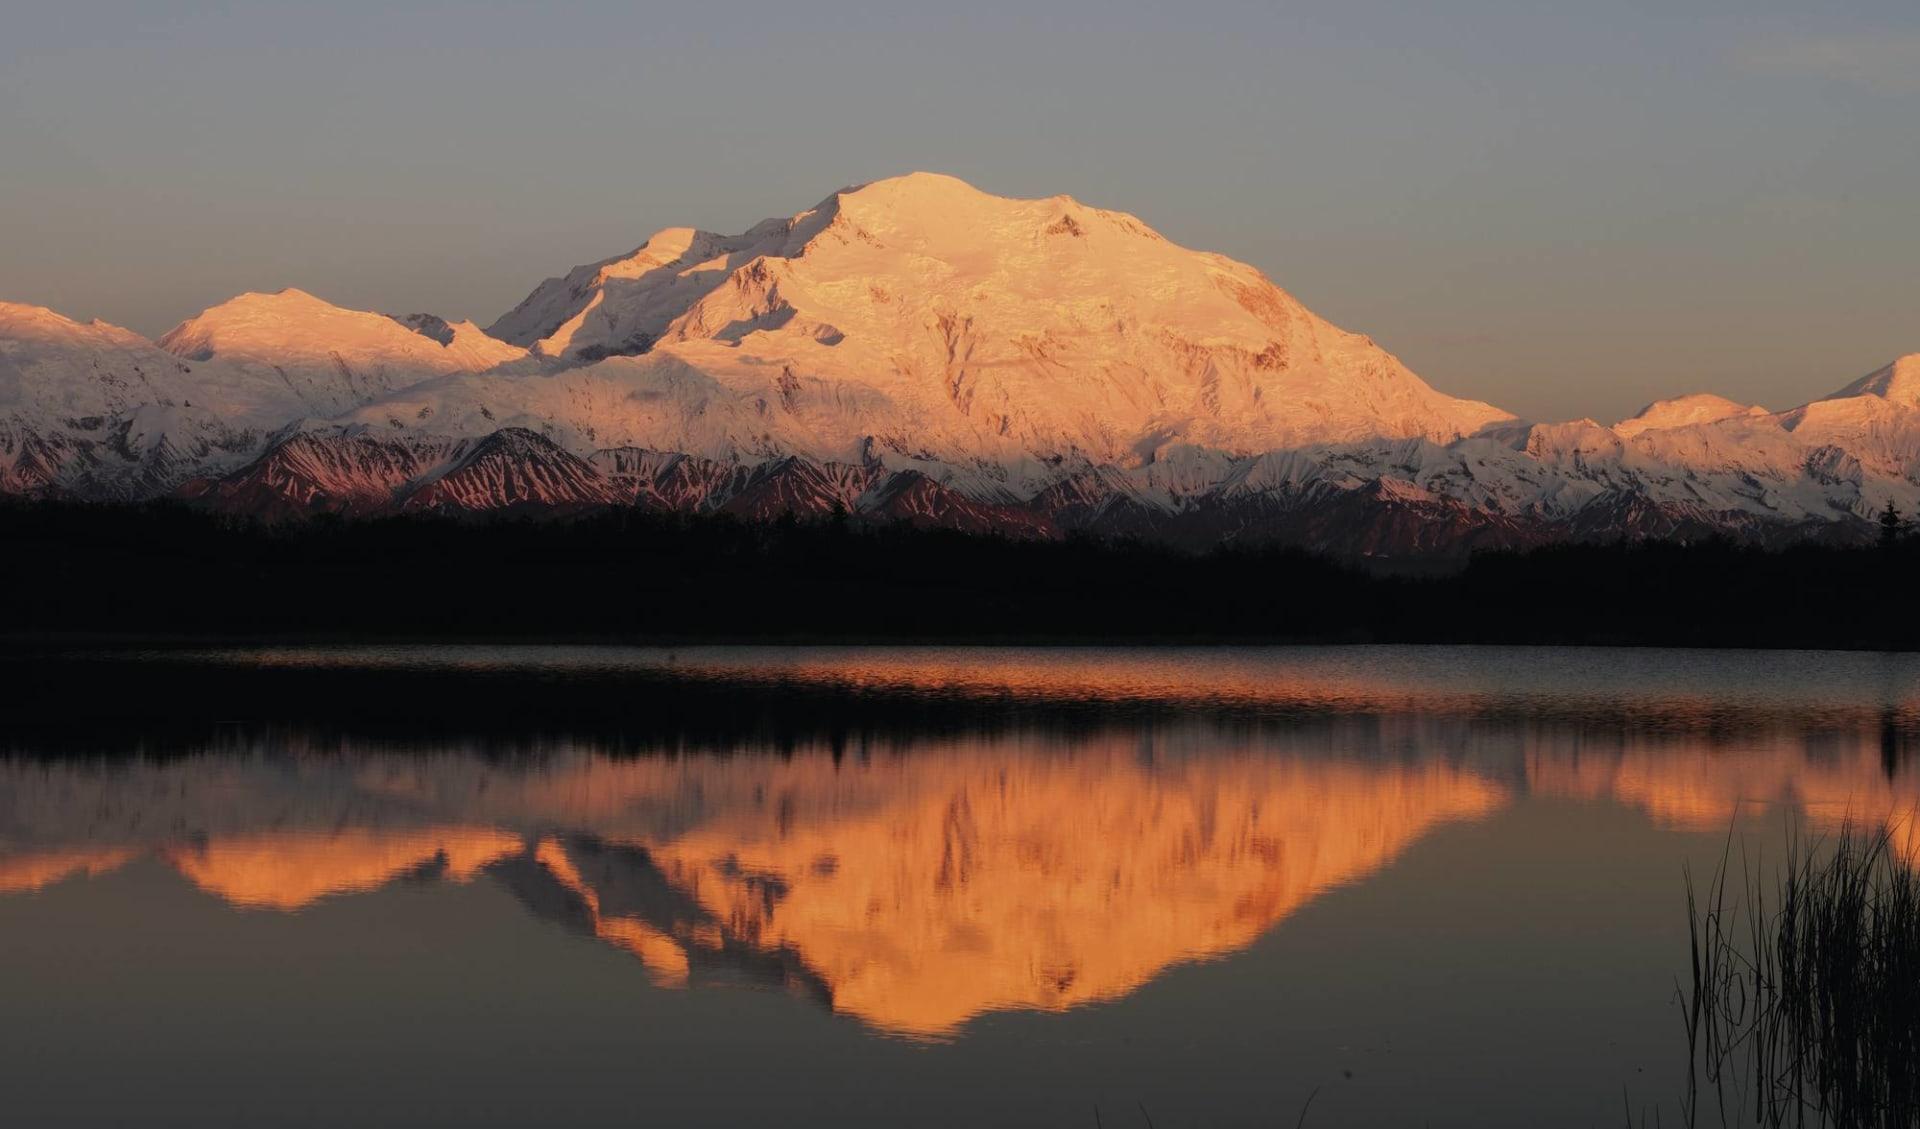 Spirit of the North ab Anchorage: Alaska - Denali Nationalpark - Berg Mount Denali